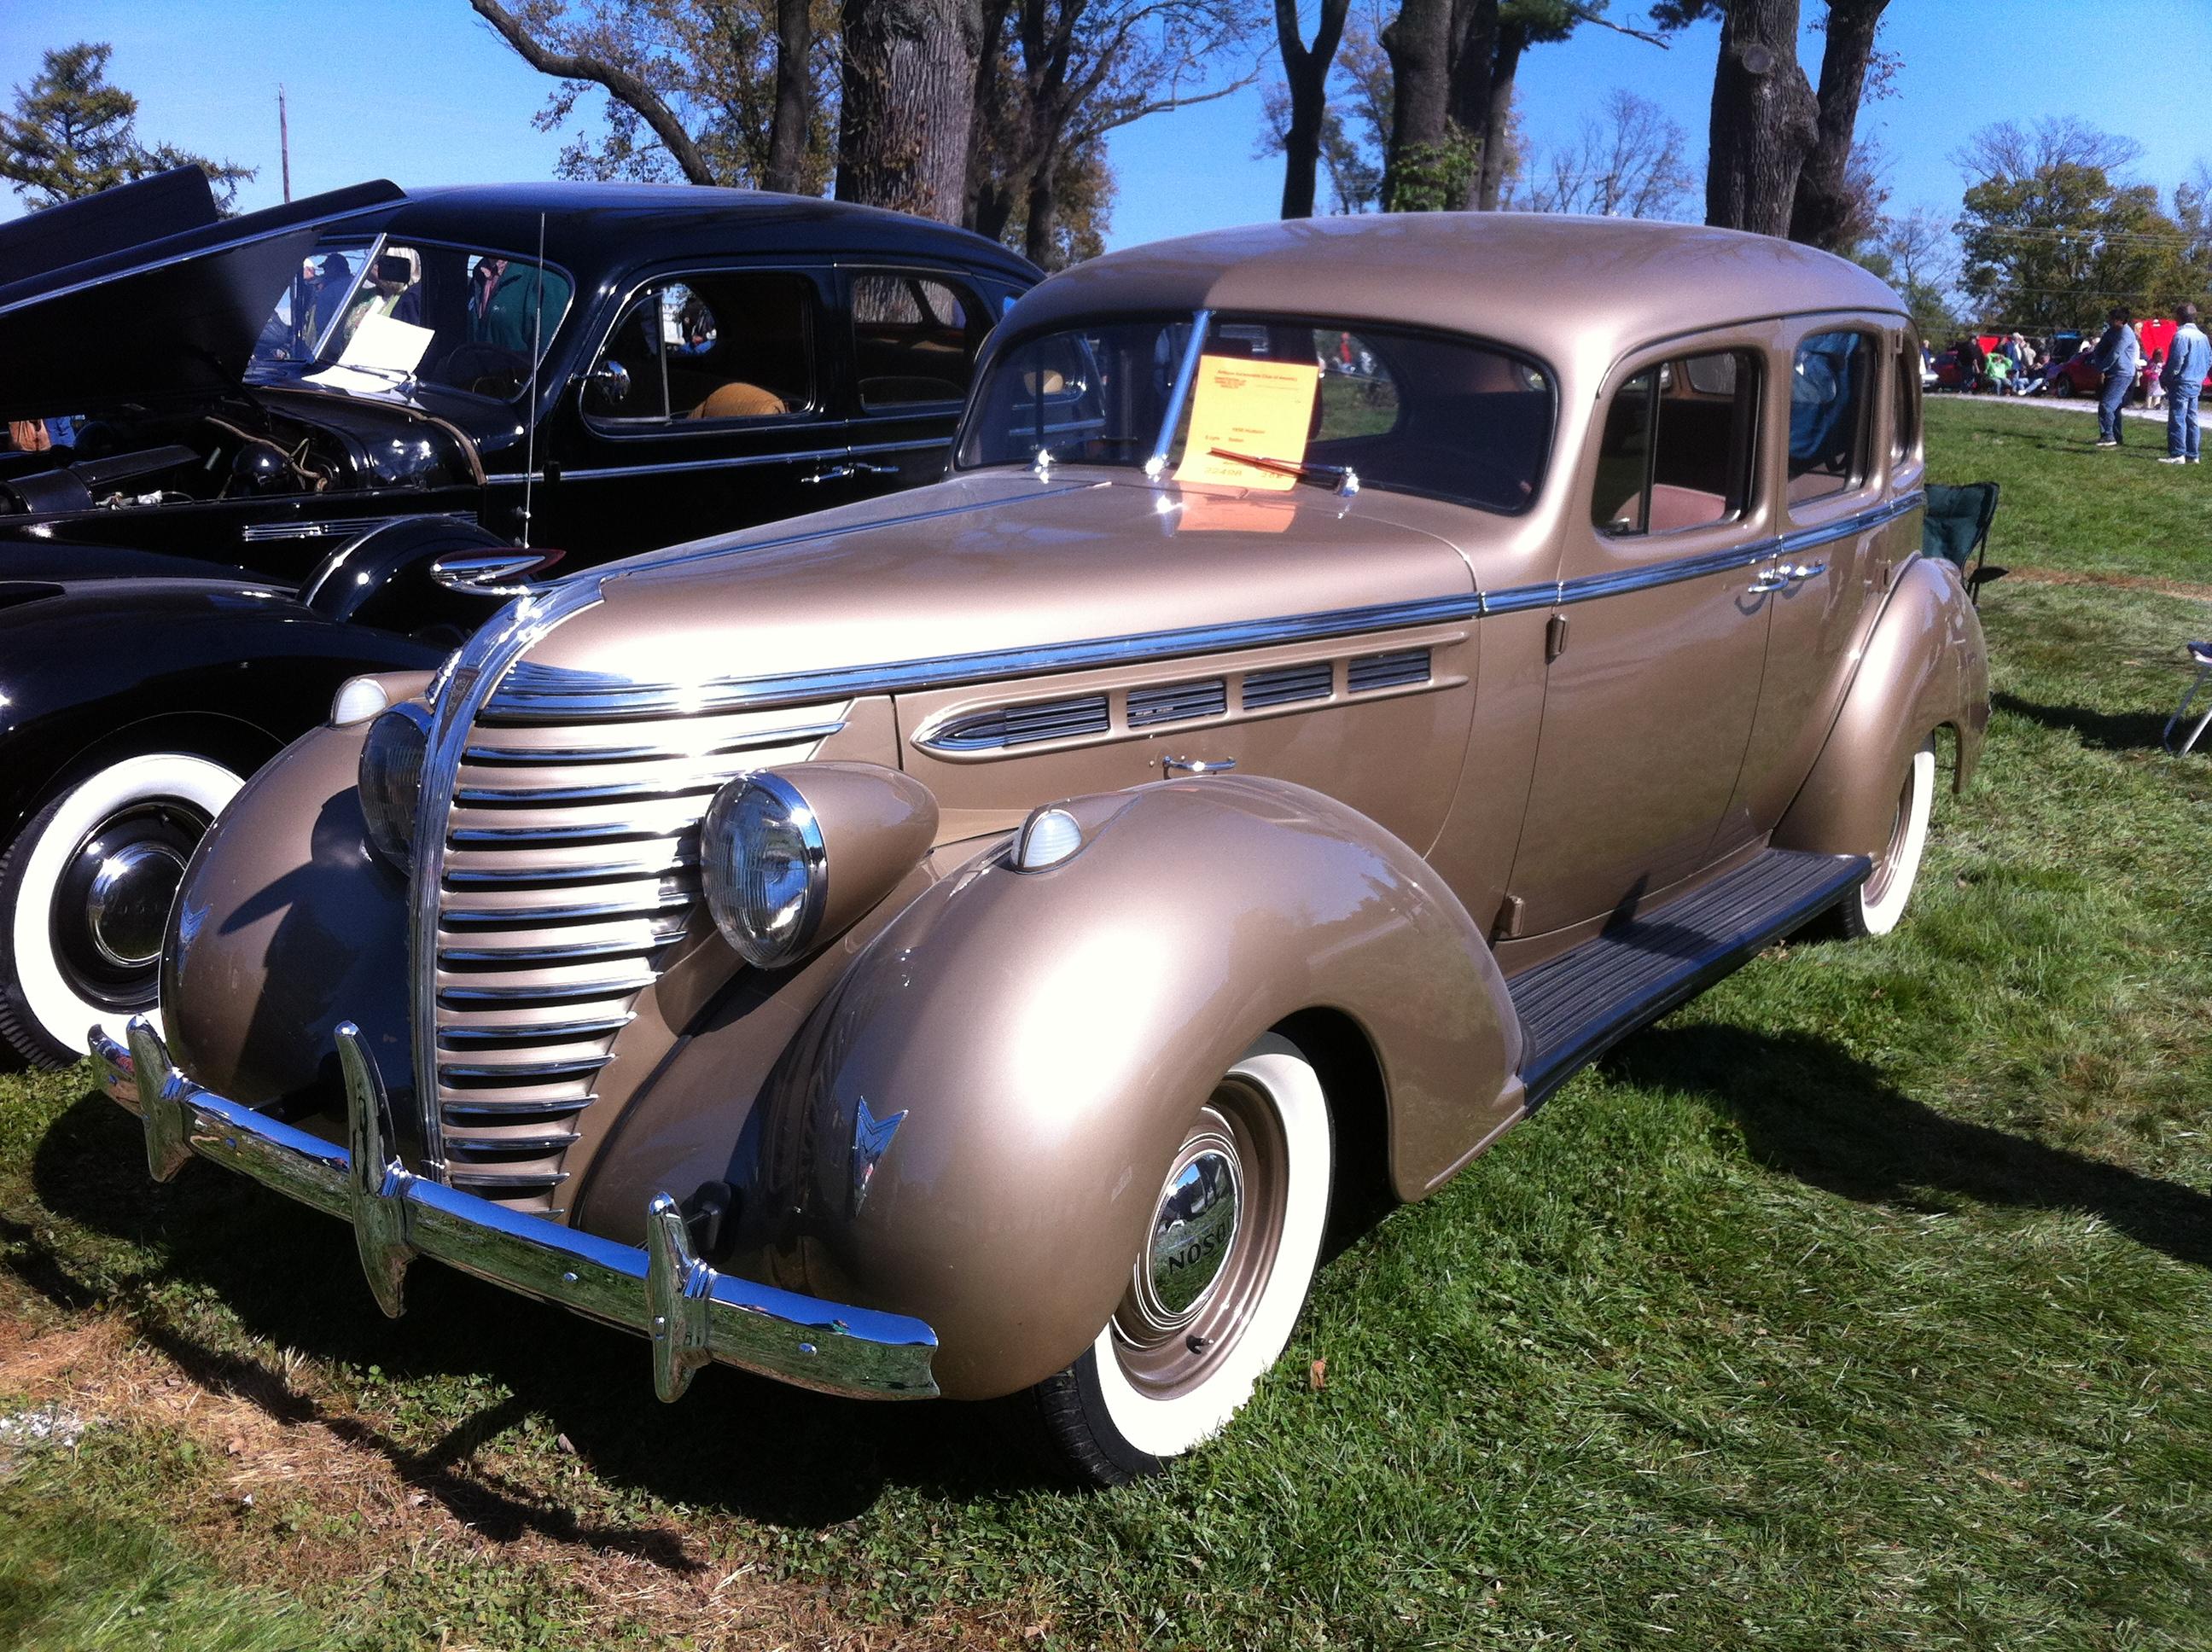 Four Door Sedan >> File:1938 Hudson six sedan Hershey 2012 a.jpg - Wikimedia Commons